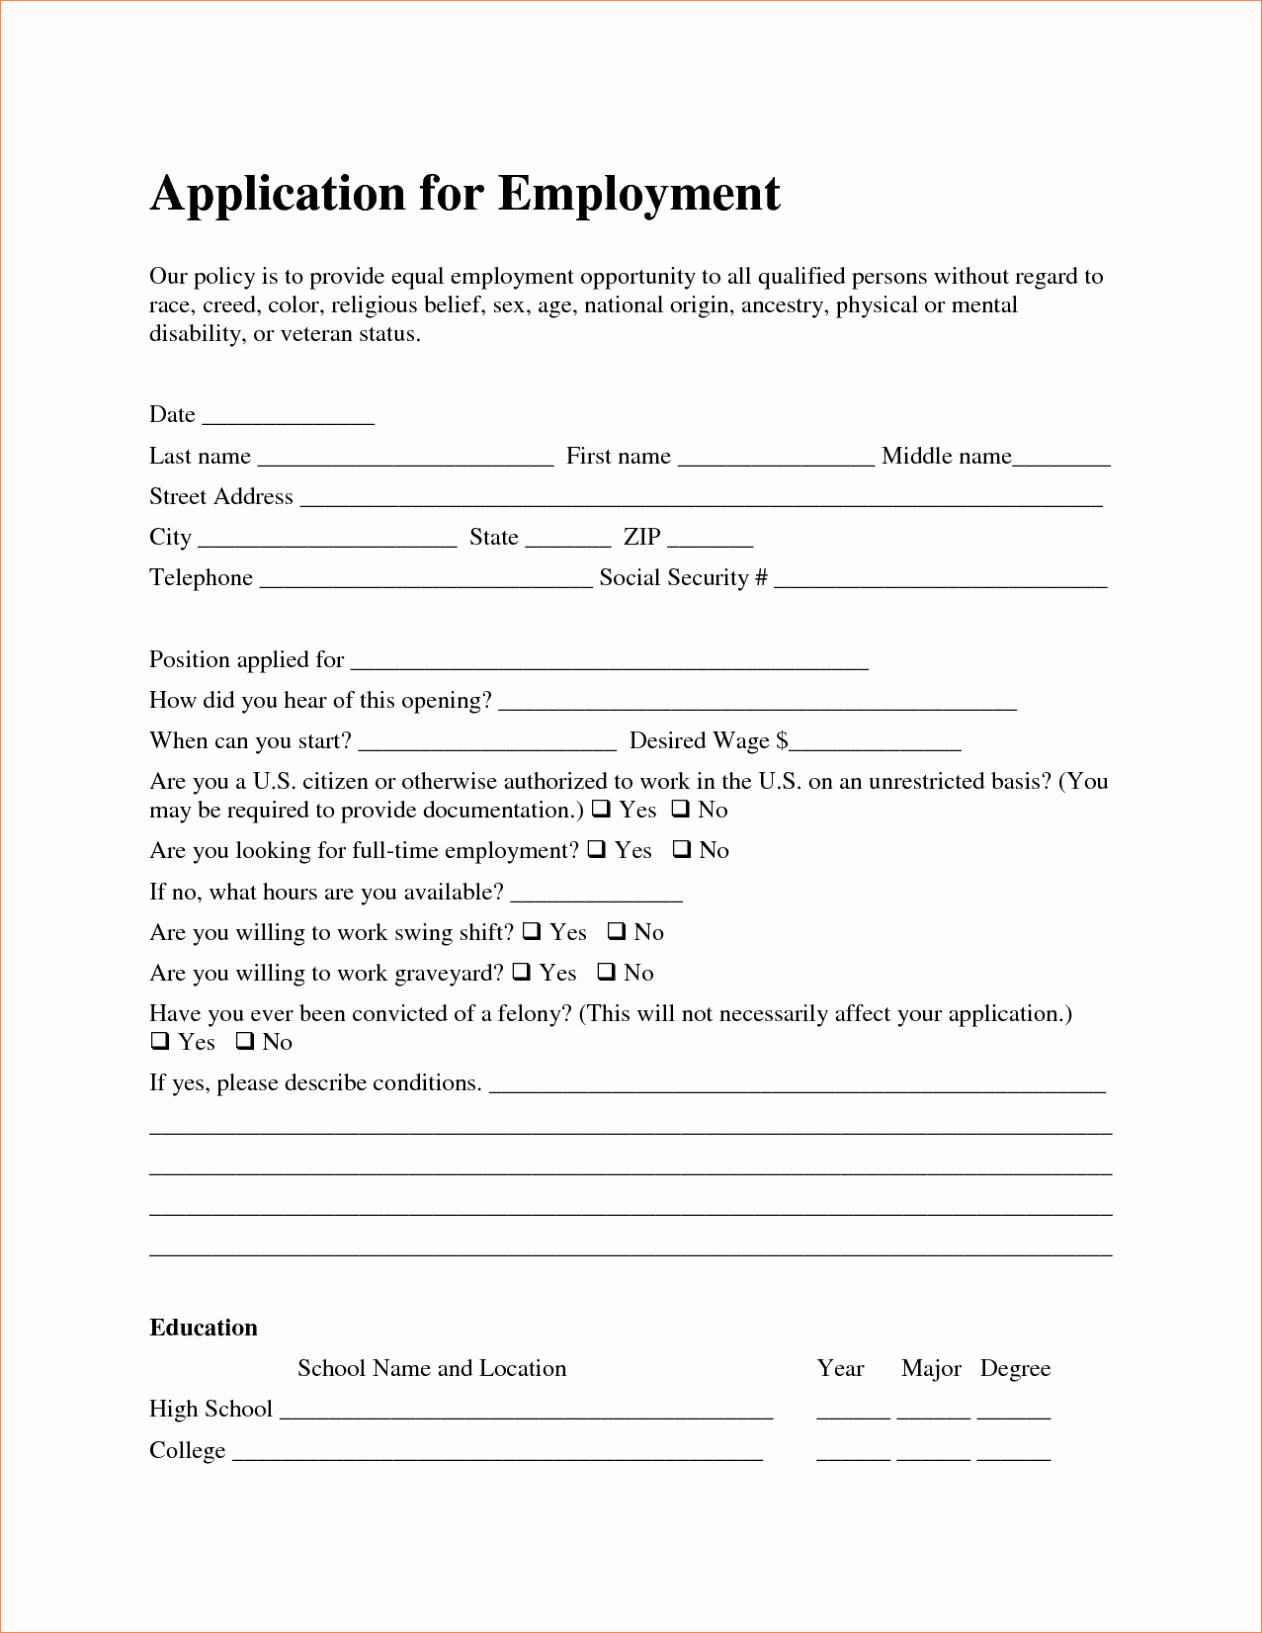 Simple Job Application Template Free Luxury Free Employment Job Application form Template Sample